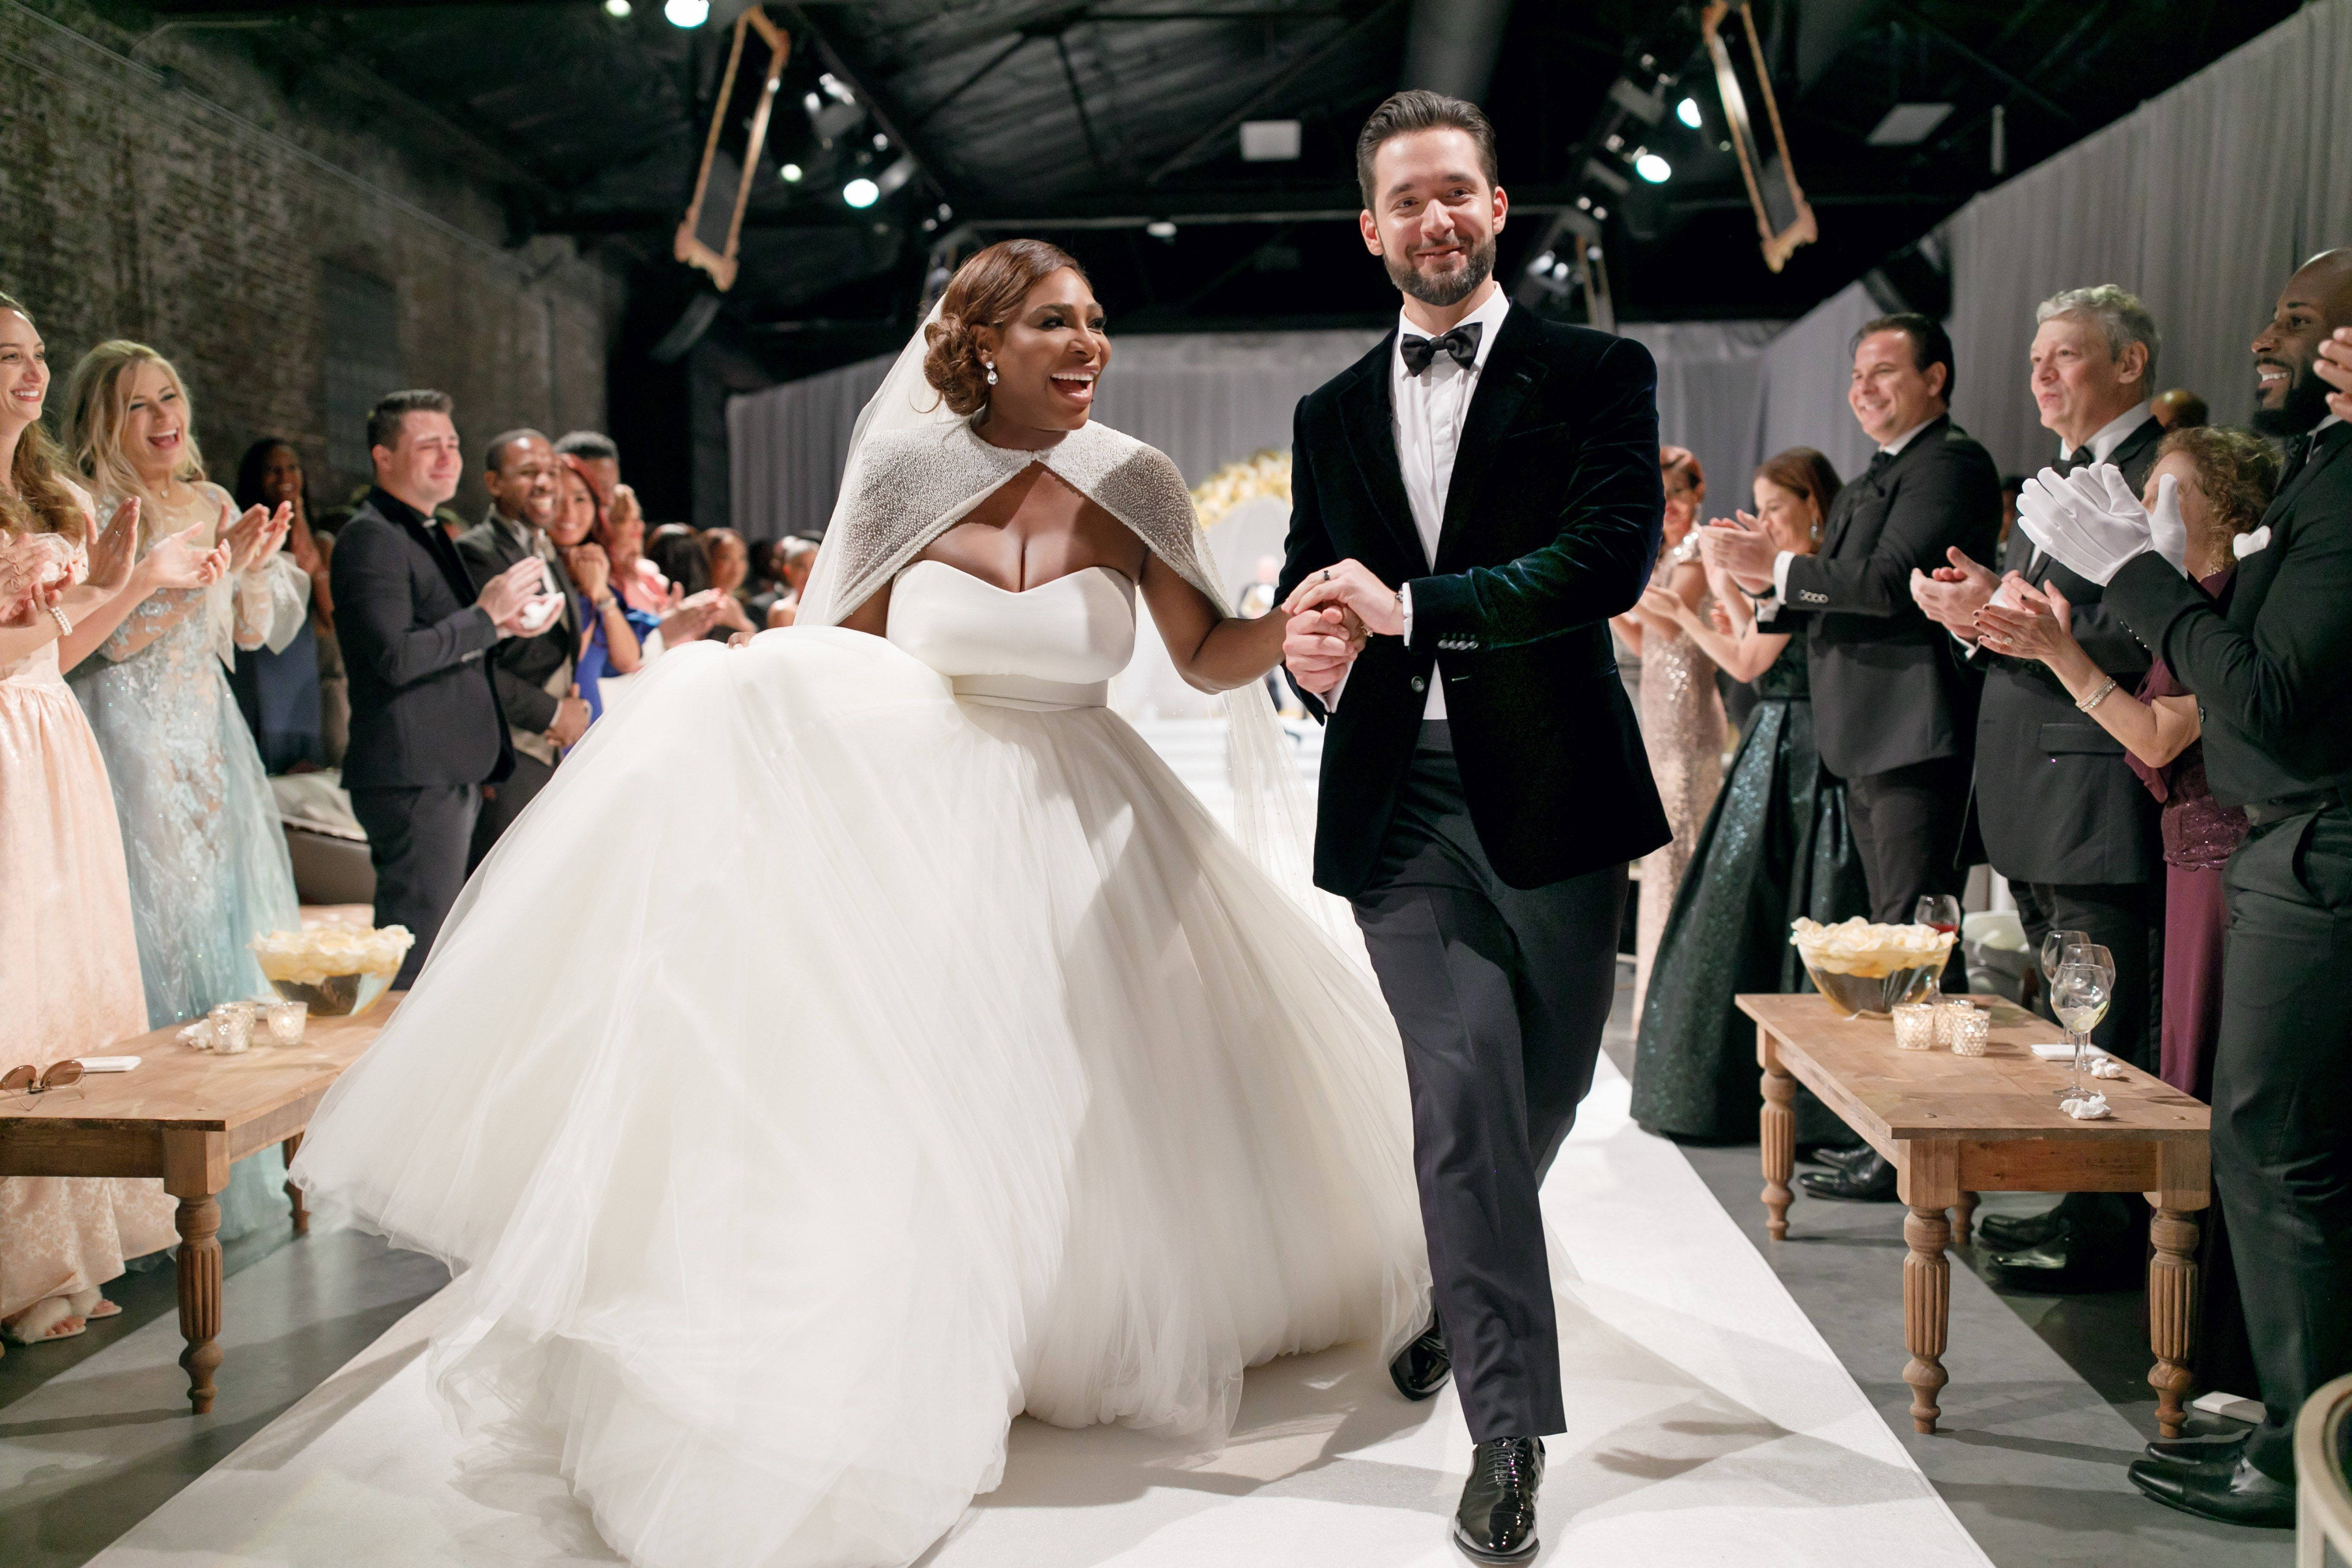 Serena Williams And Alexis Ohanian S Wedding Photo Album Is Here Serena Williams Wedding Celebrity Weddings Wedding Dress Prices